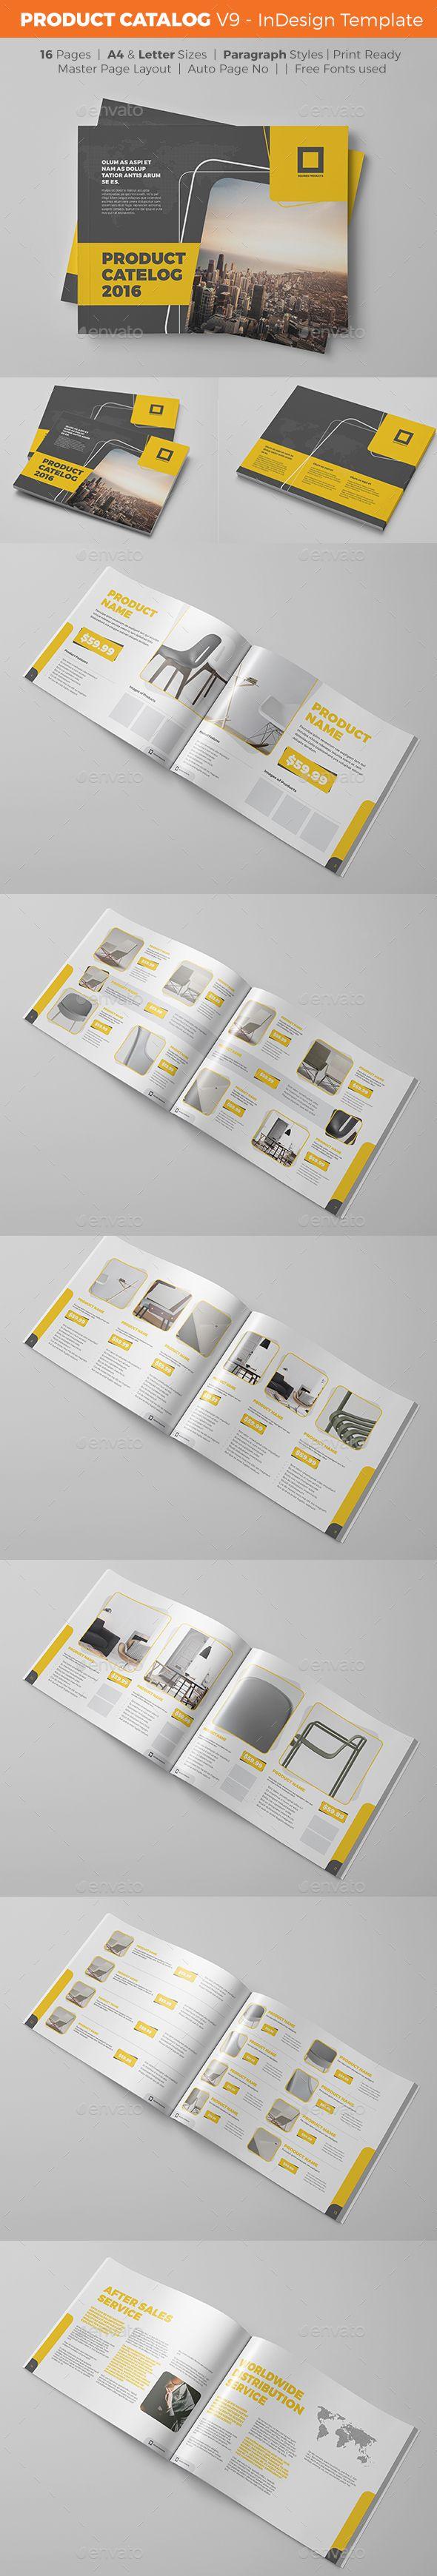 Product Catalog Template - V9 - Catalogs Brochures